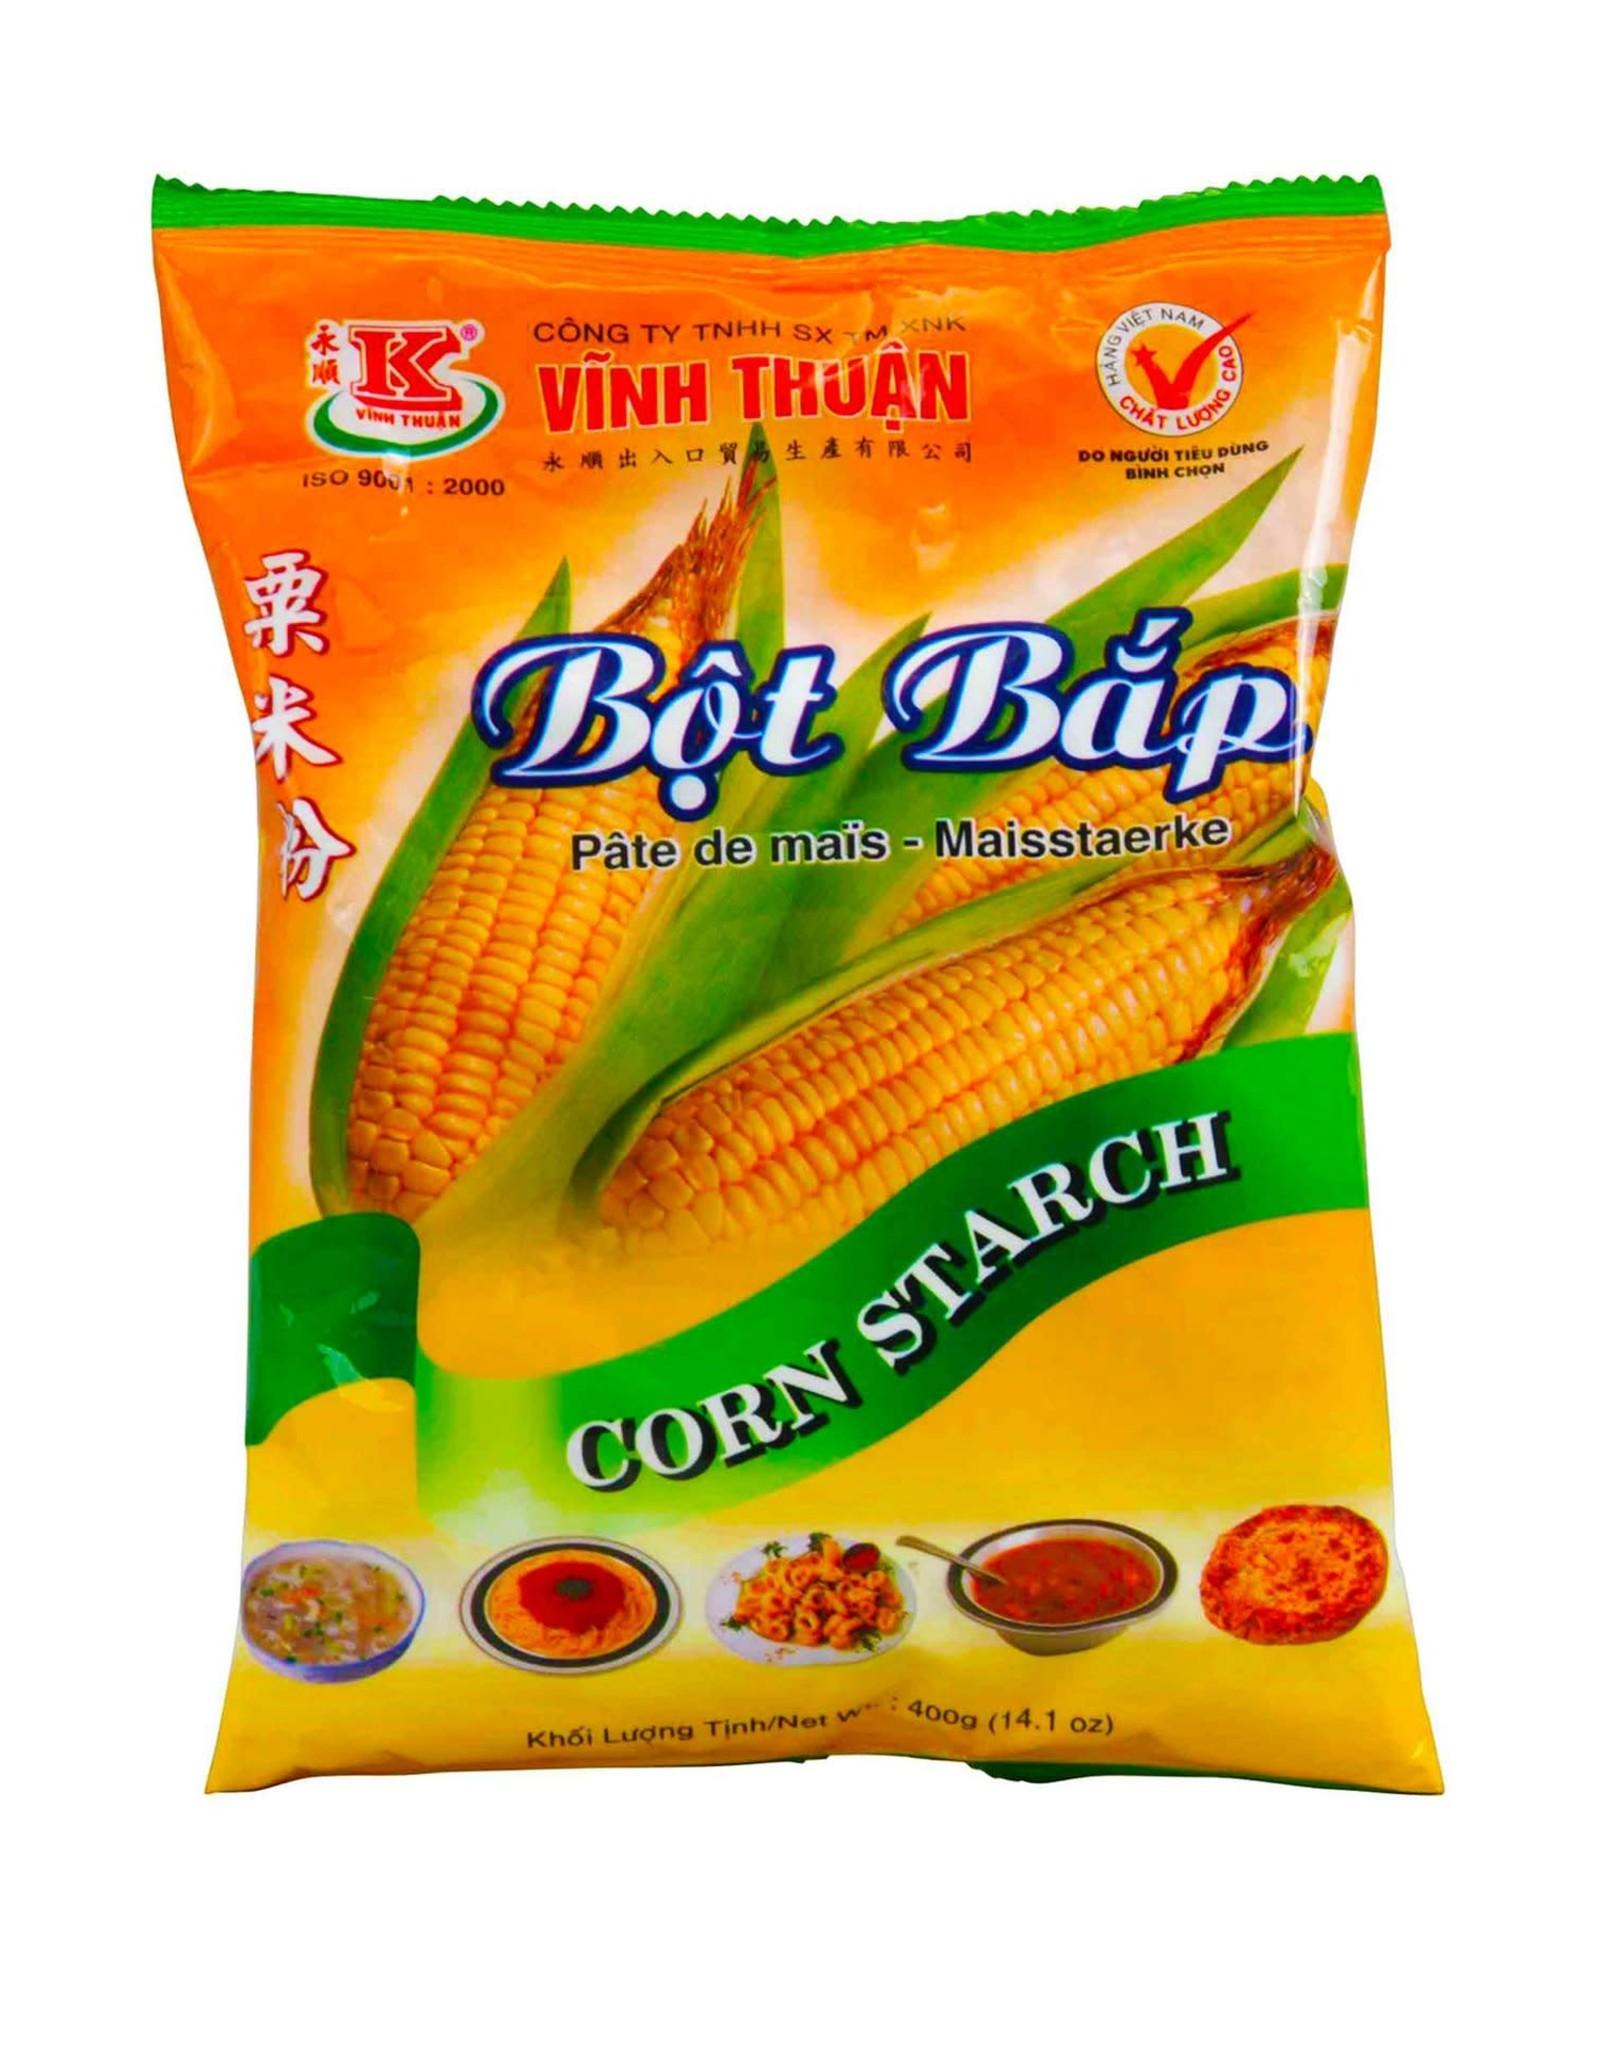 Vinh Thuan Corn Starch Vinh Thuan 400g